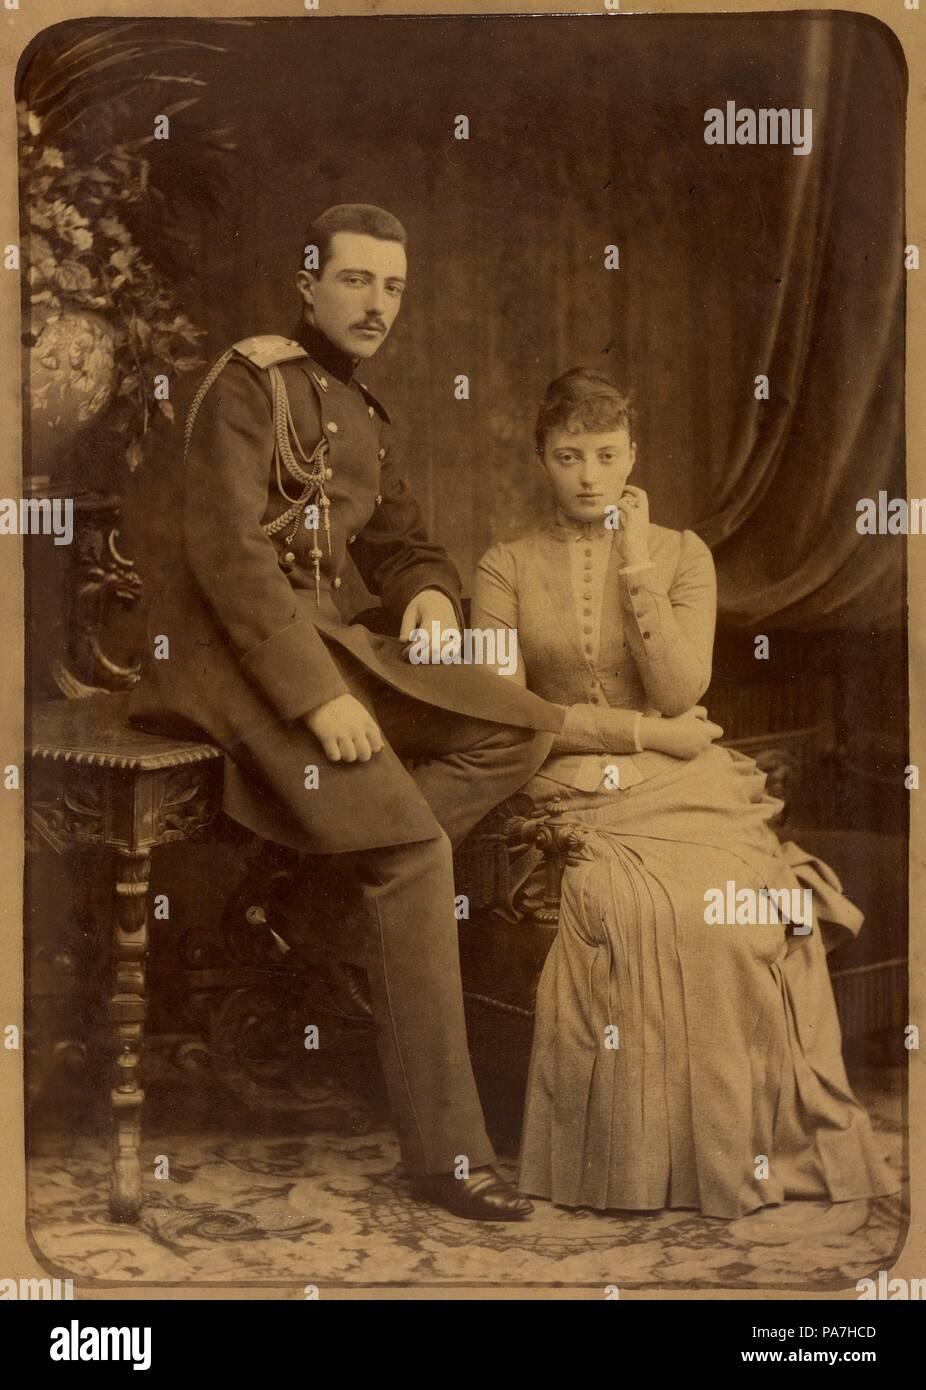 Anastasia Romanov PortraitStock Photos and Images